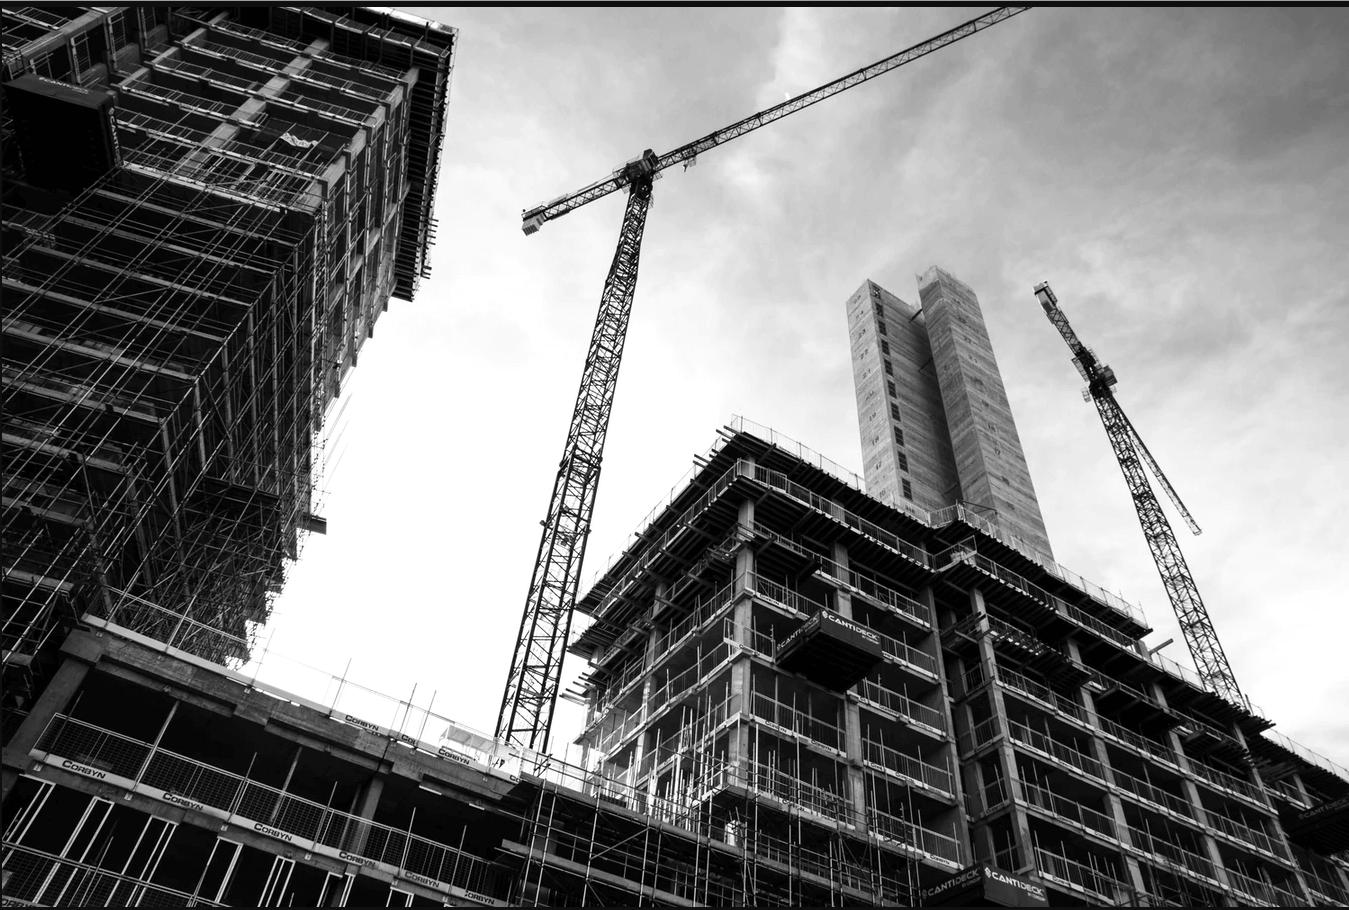 construction-sector-amnesty-plan-extended-till-dec-31-2021